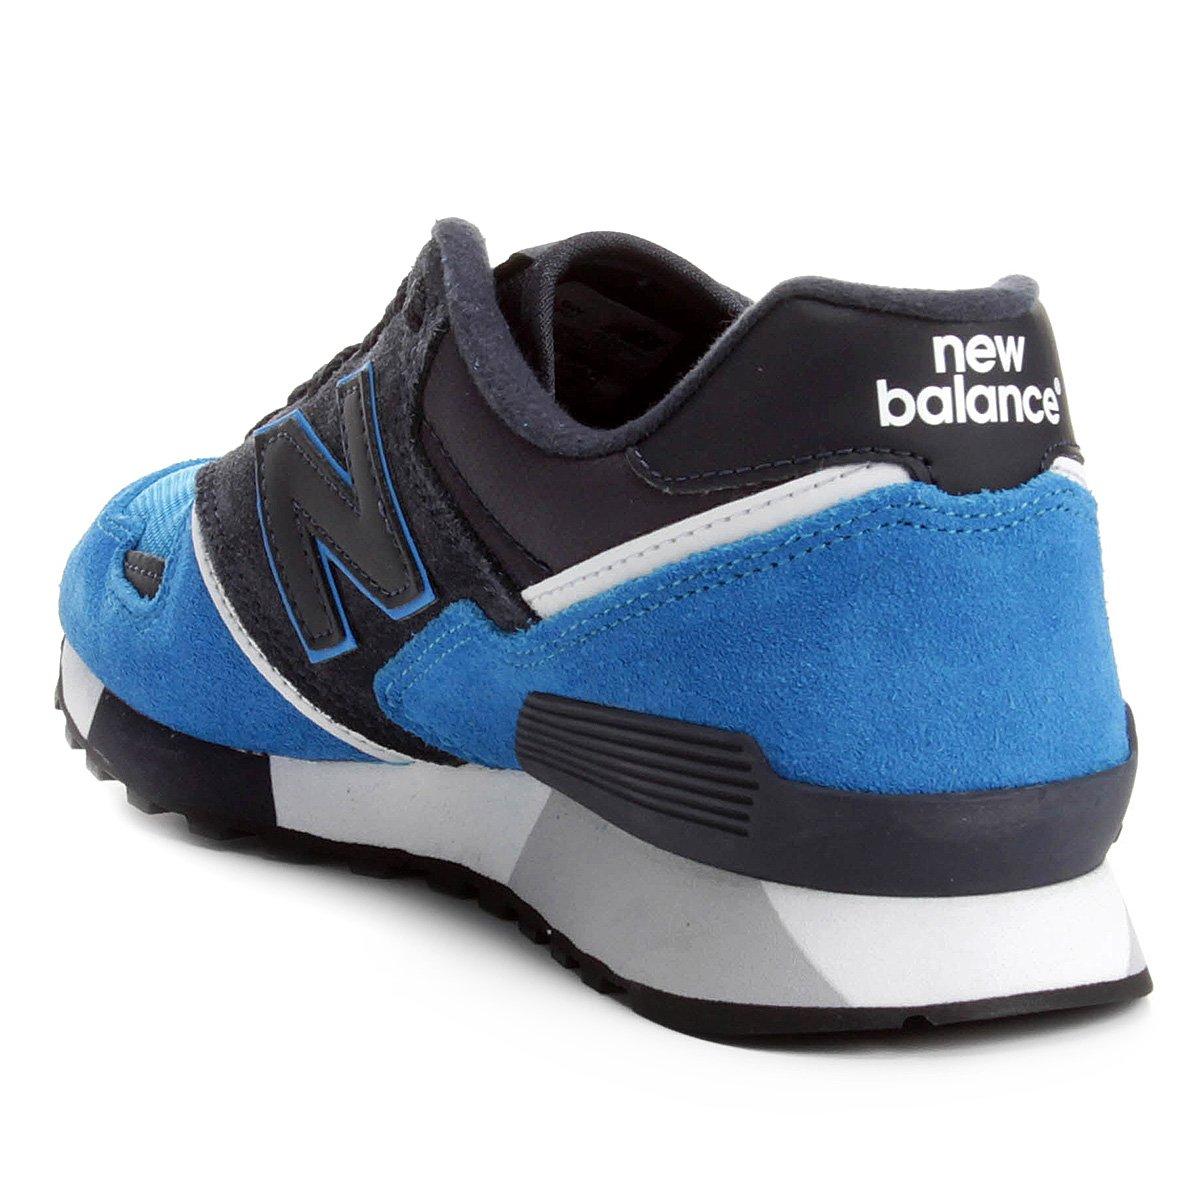 U New 446 Tênis Balance New Azul Balance Marinho e 446 Tênis U Claro qxwRZX0p